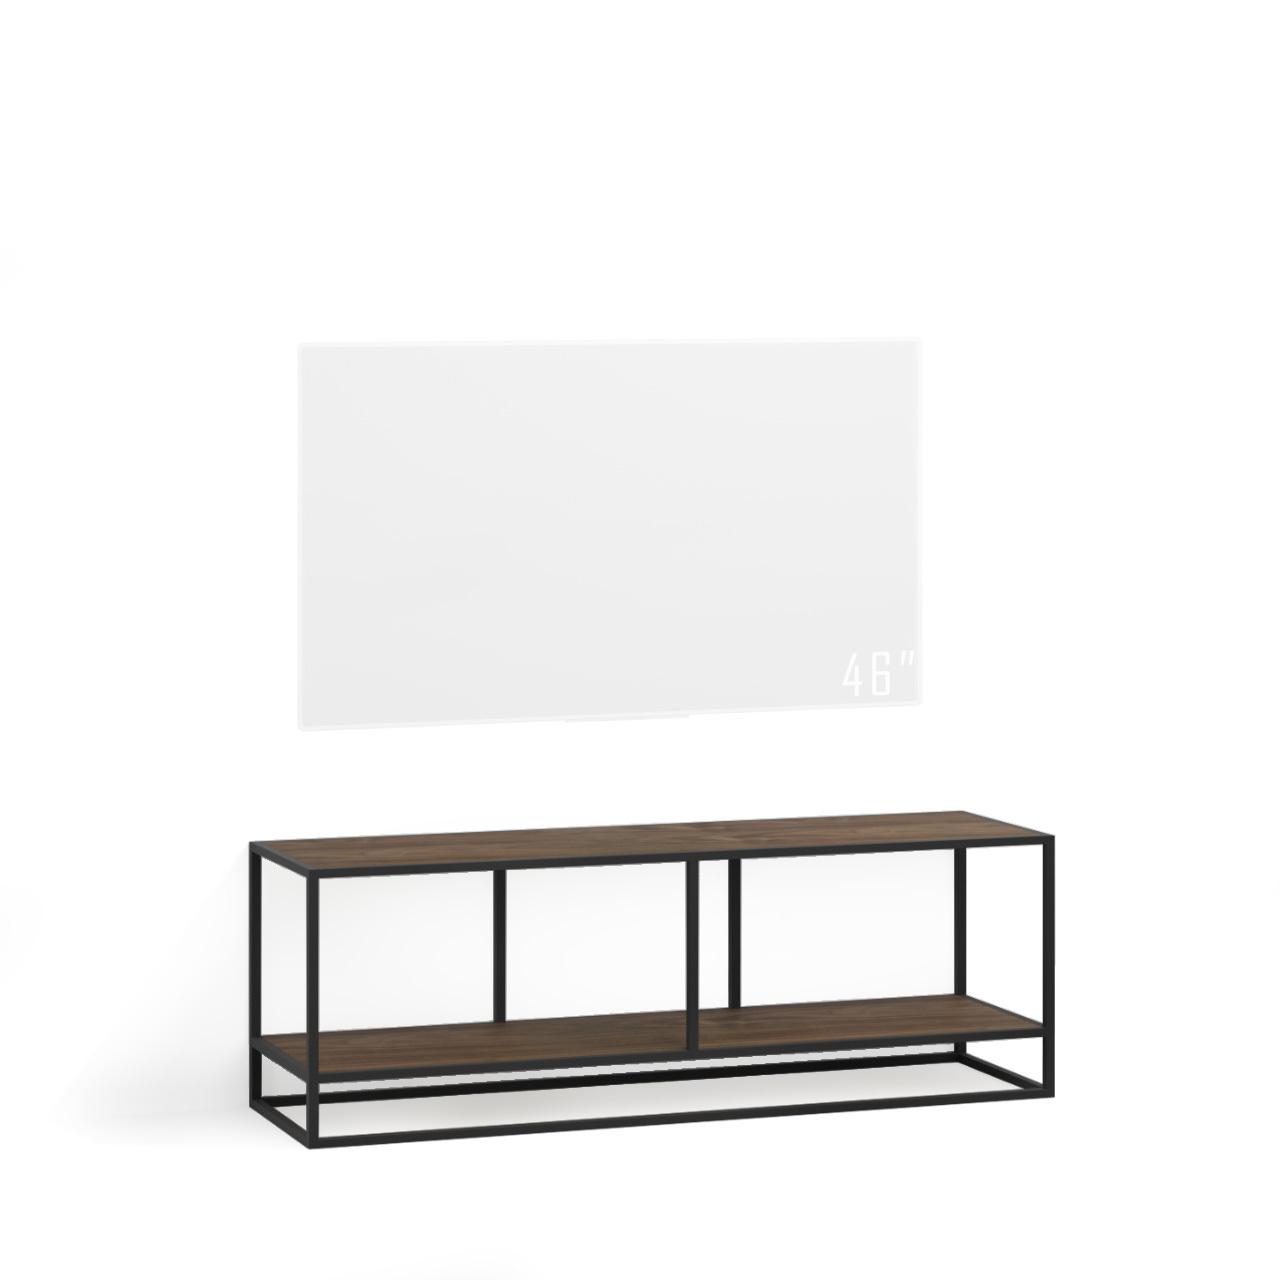 Тумба TV stand lite 2 black - вид 5